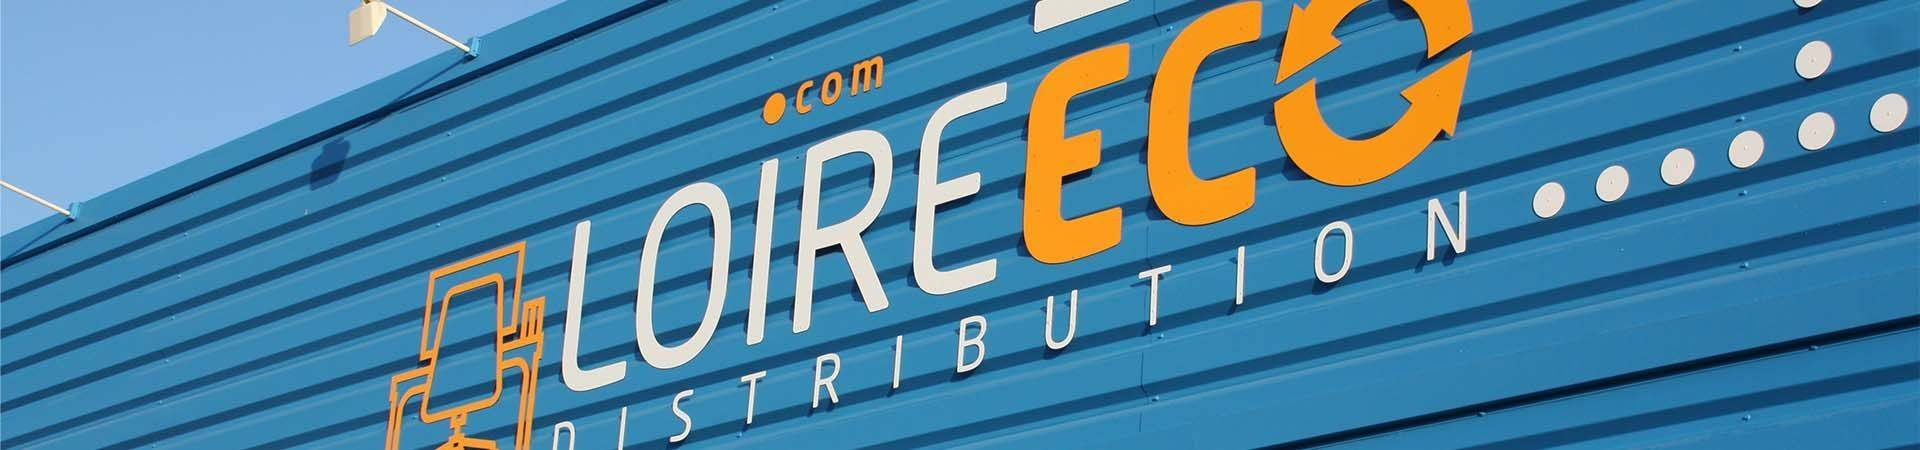 Façade magasin Loire Eco Distribution